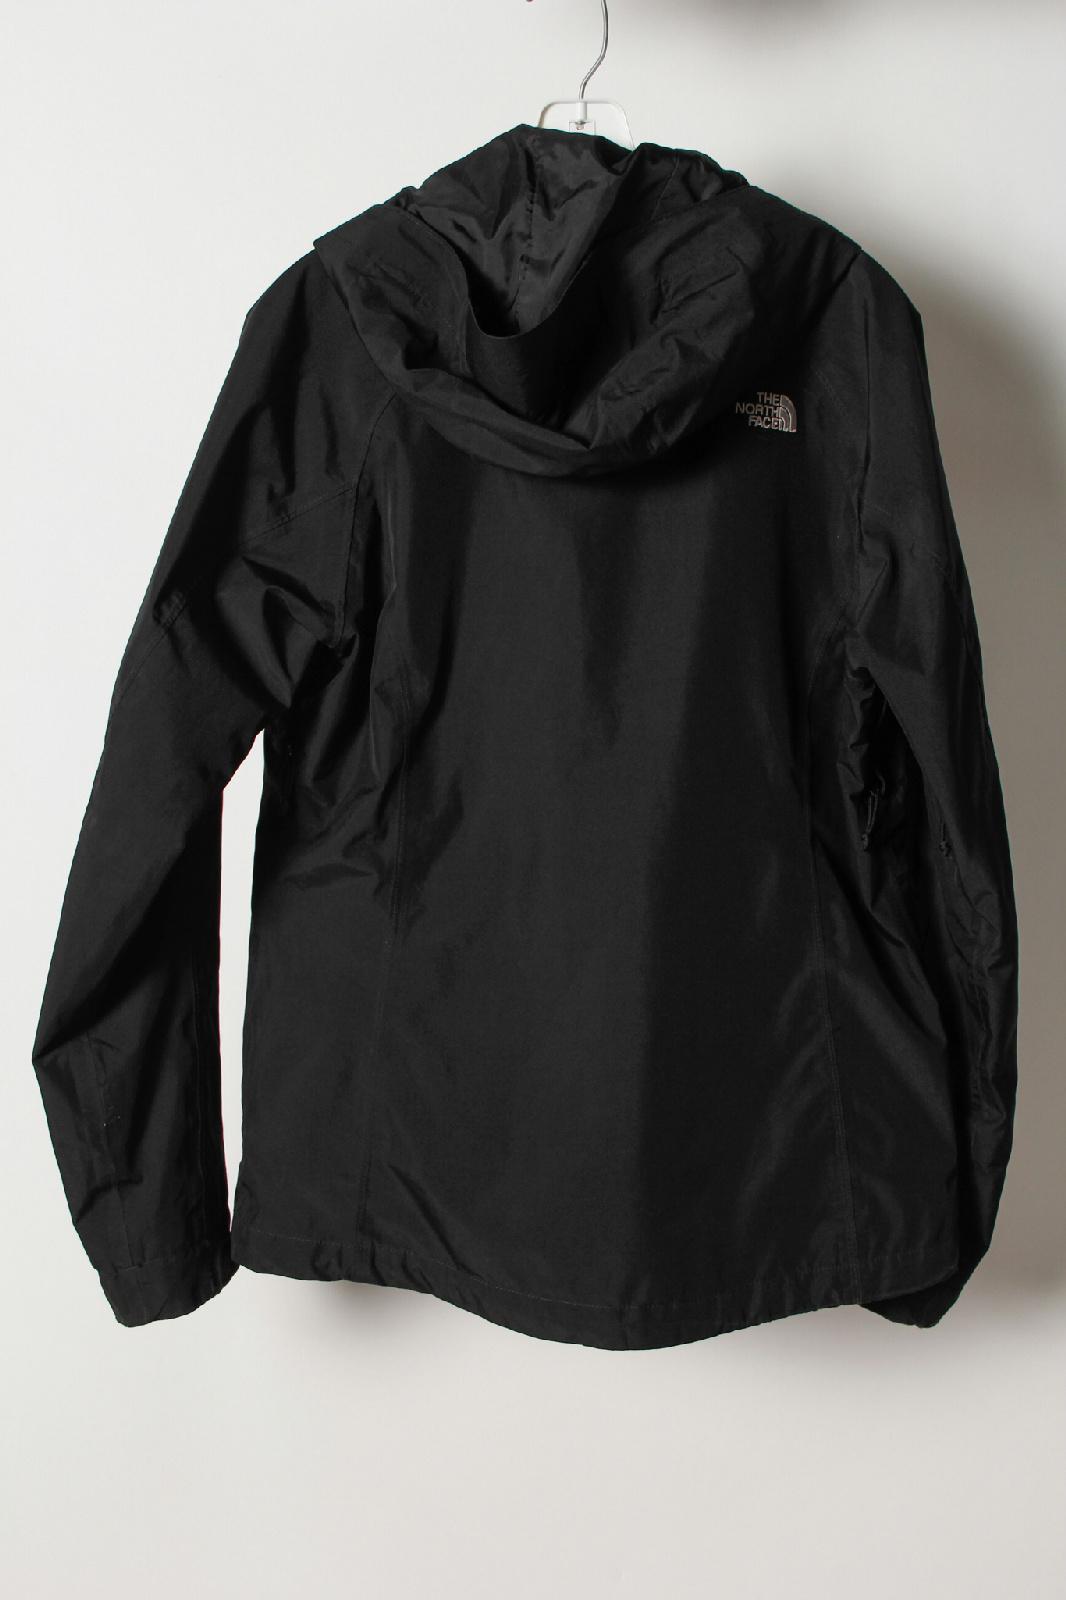 the north face hyvent black hood zip up windbreaker jacket. Black Bedroom Furniture Sets. Home Design Ideas